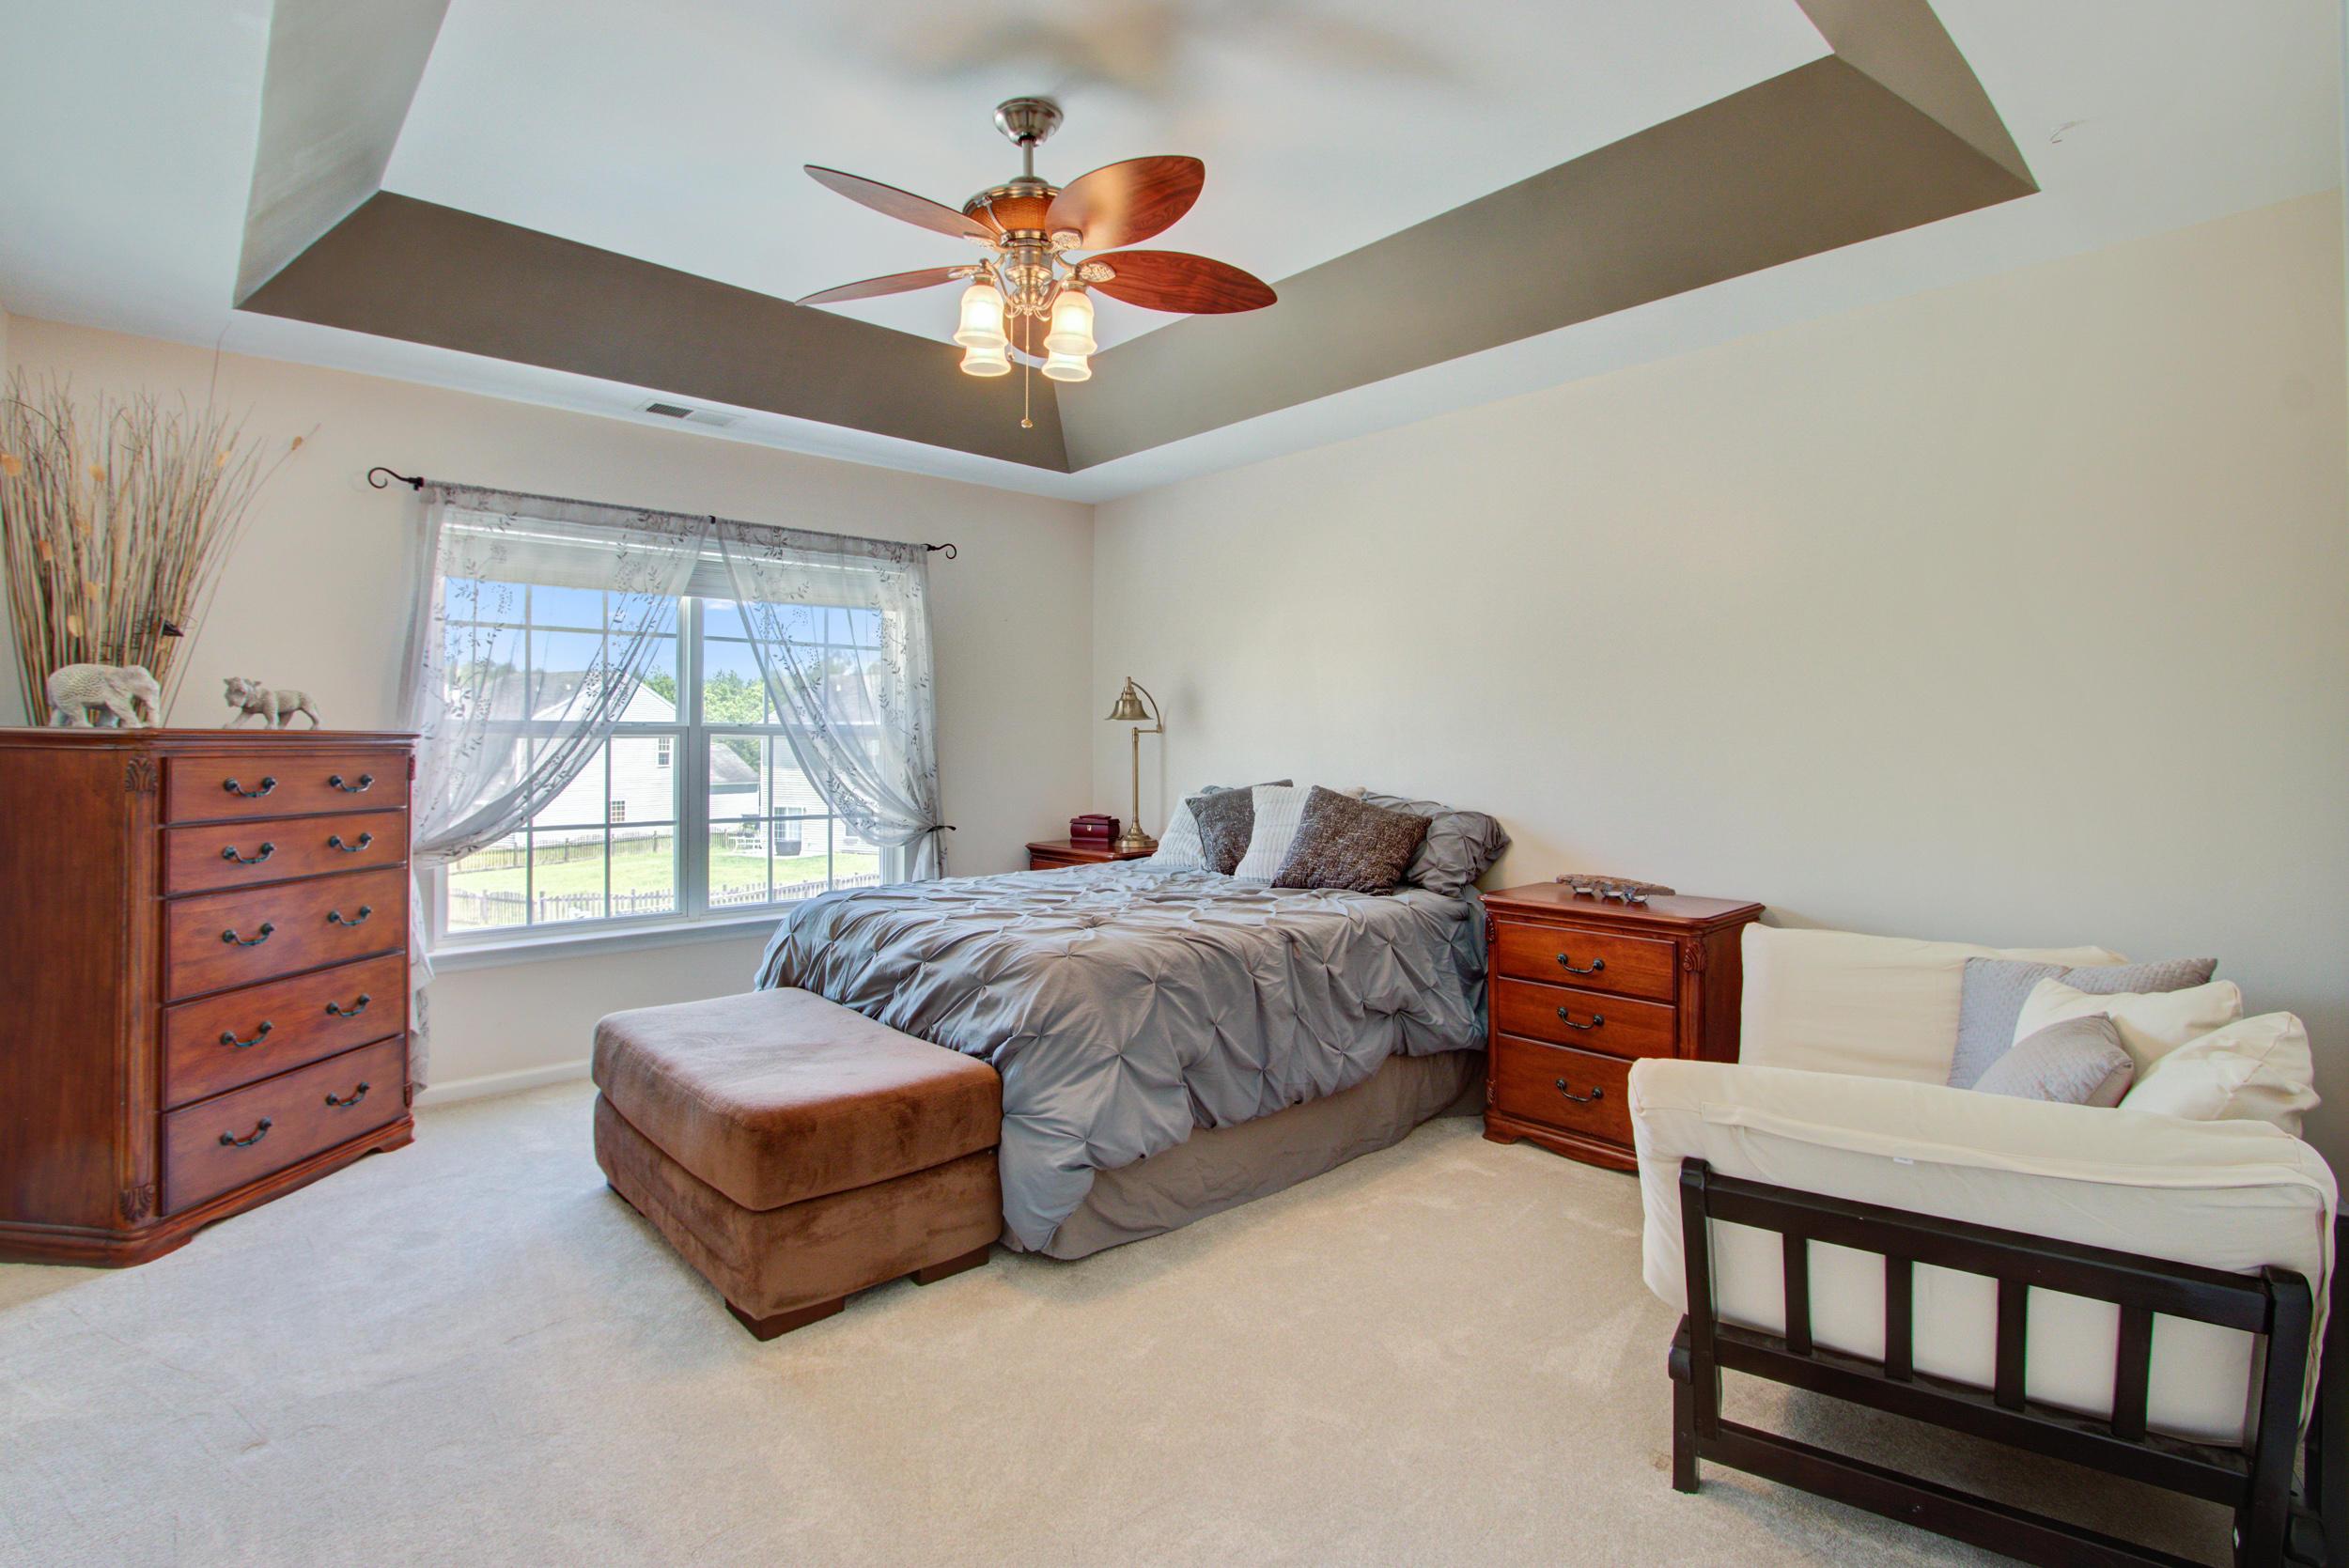 Oakley Pointe Homes For Sale - 576 English Oak, Moncks Corner, SC - 46